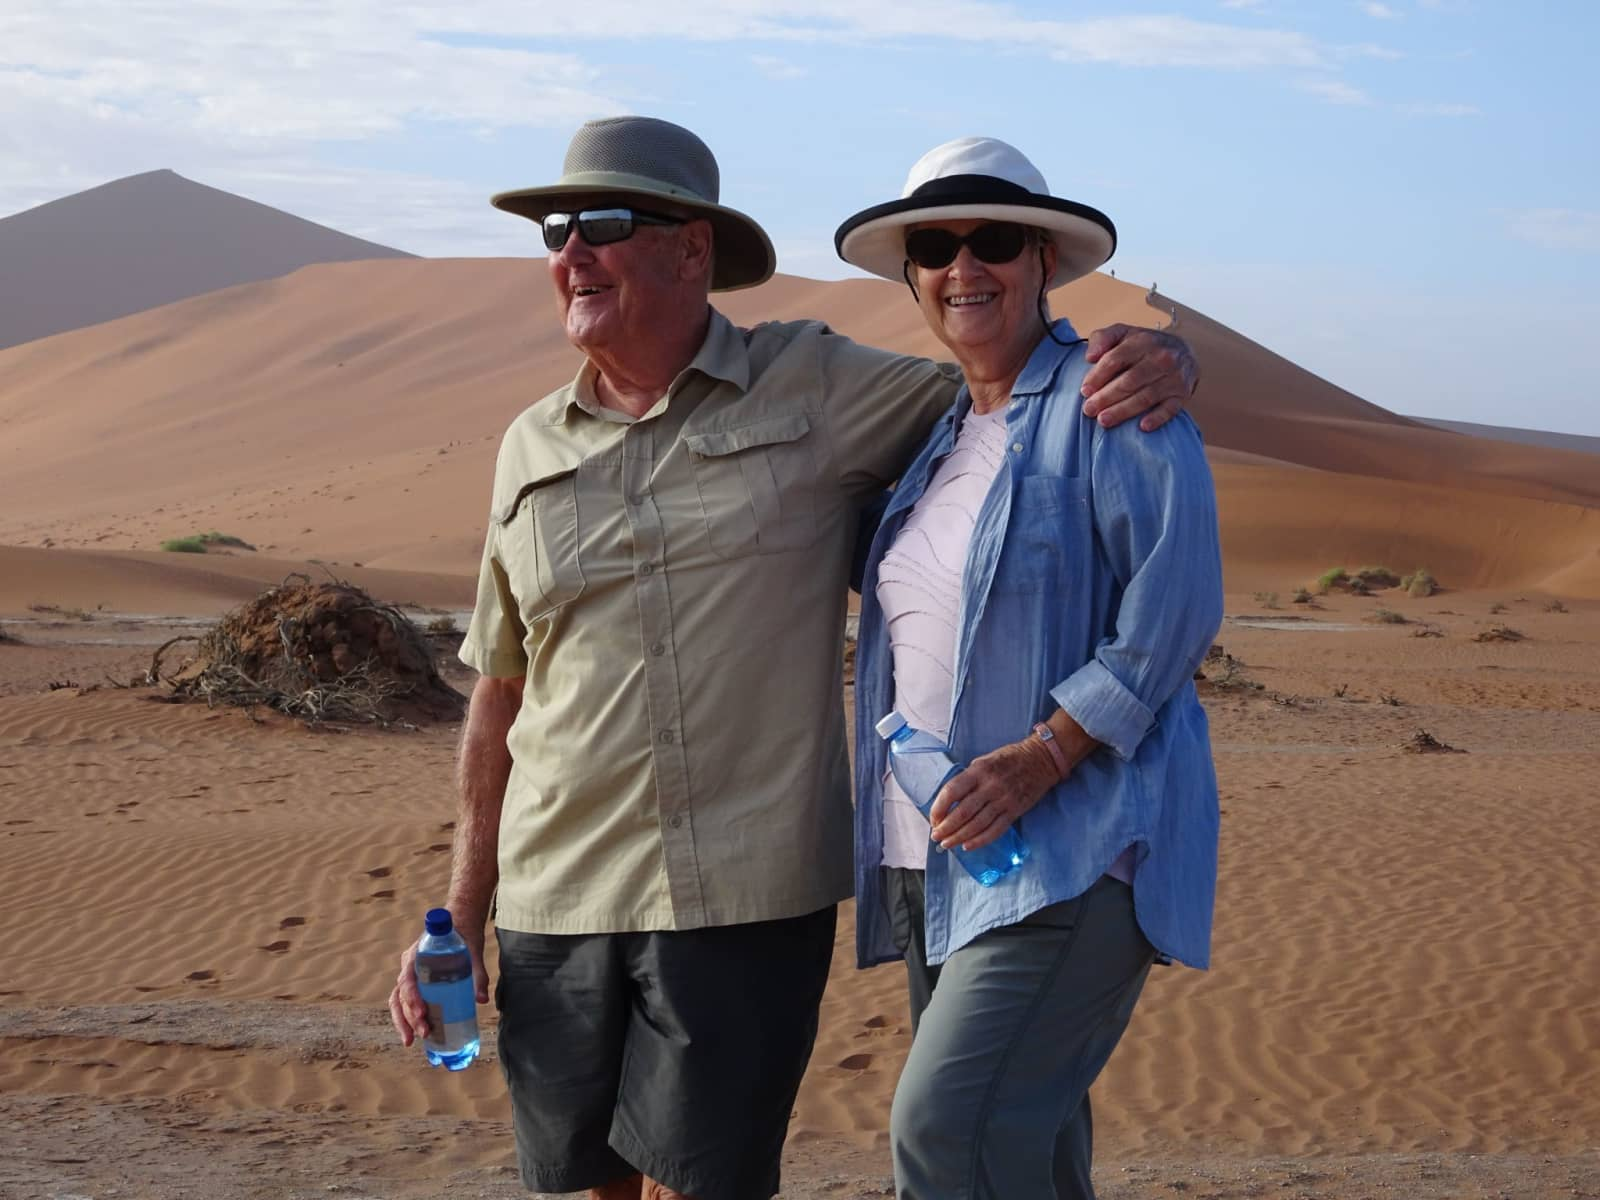 Dan & Wendy from Collingwood, Ontario, Canada